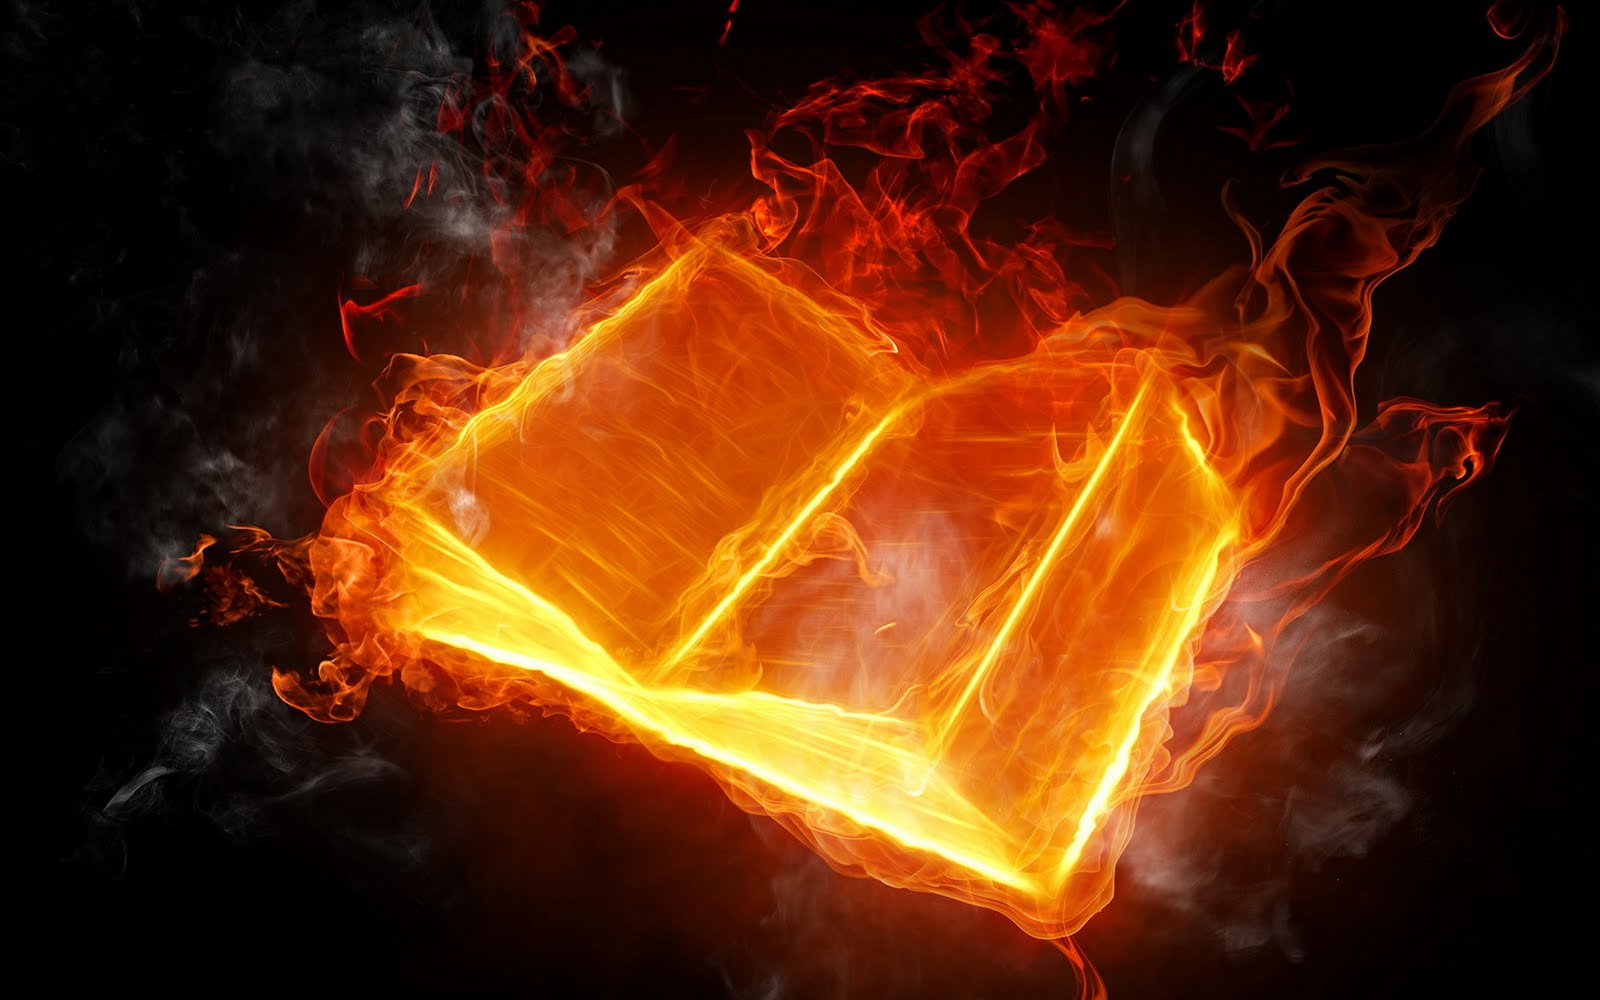 http://4.bp.blogspot.com/-CB6R0x9yuvc/T_mia2a3t7I/AAAAAAAAIco/9Y3RzsErbfA/s1600/Fire-Book-wallpaper1.jpg